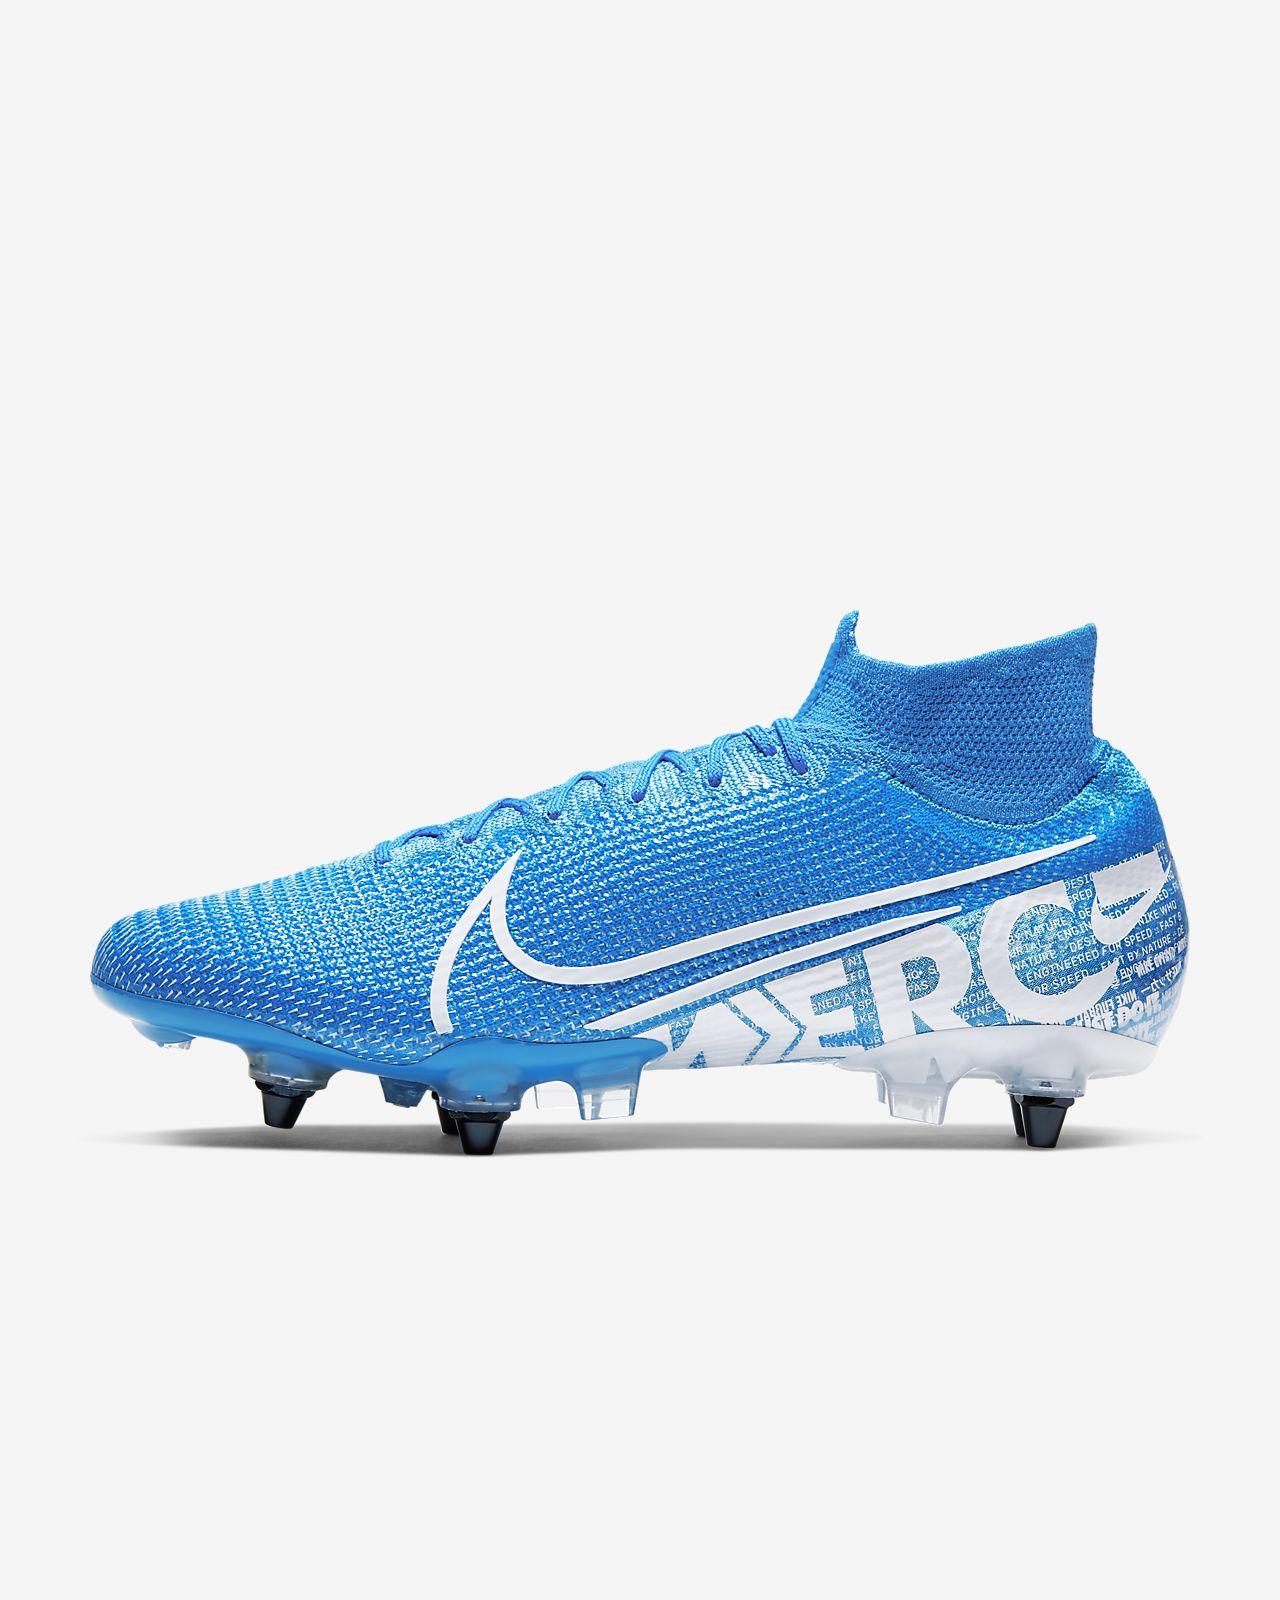 Chaussure de football à crampons pour terrain gras Nike Mercurial Superfly 7 Elite SG-PRO Anti-Clog Traction